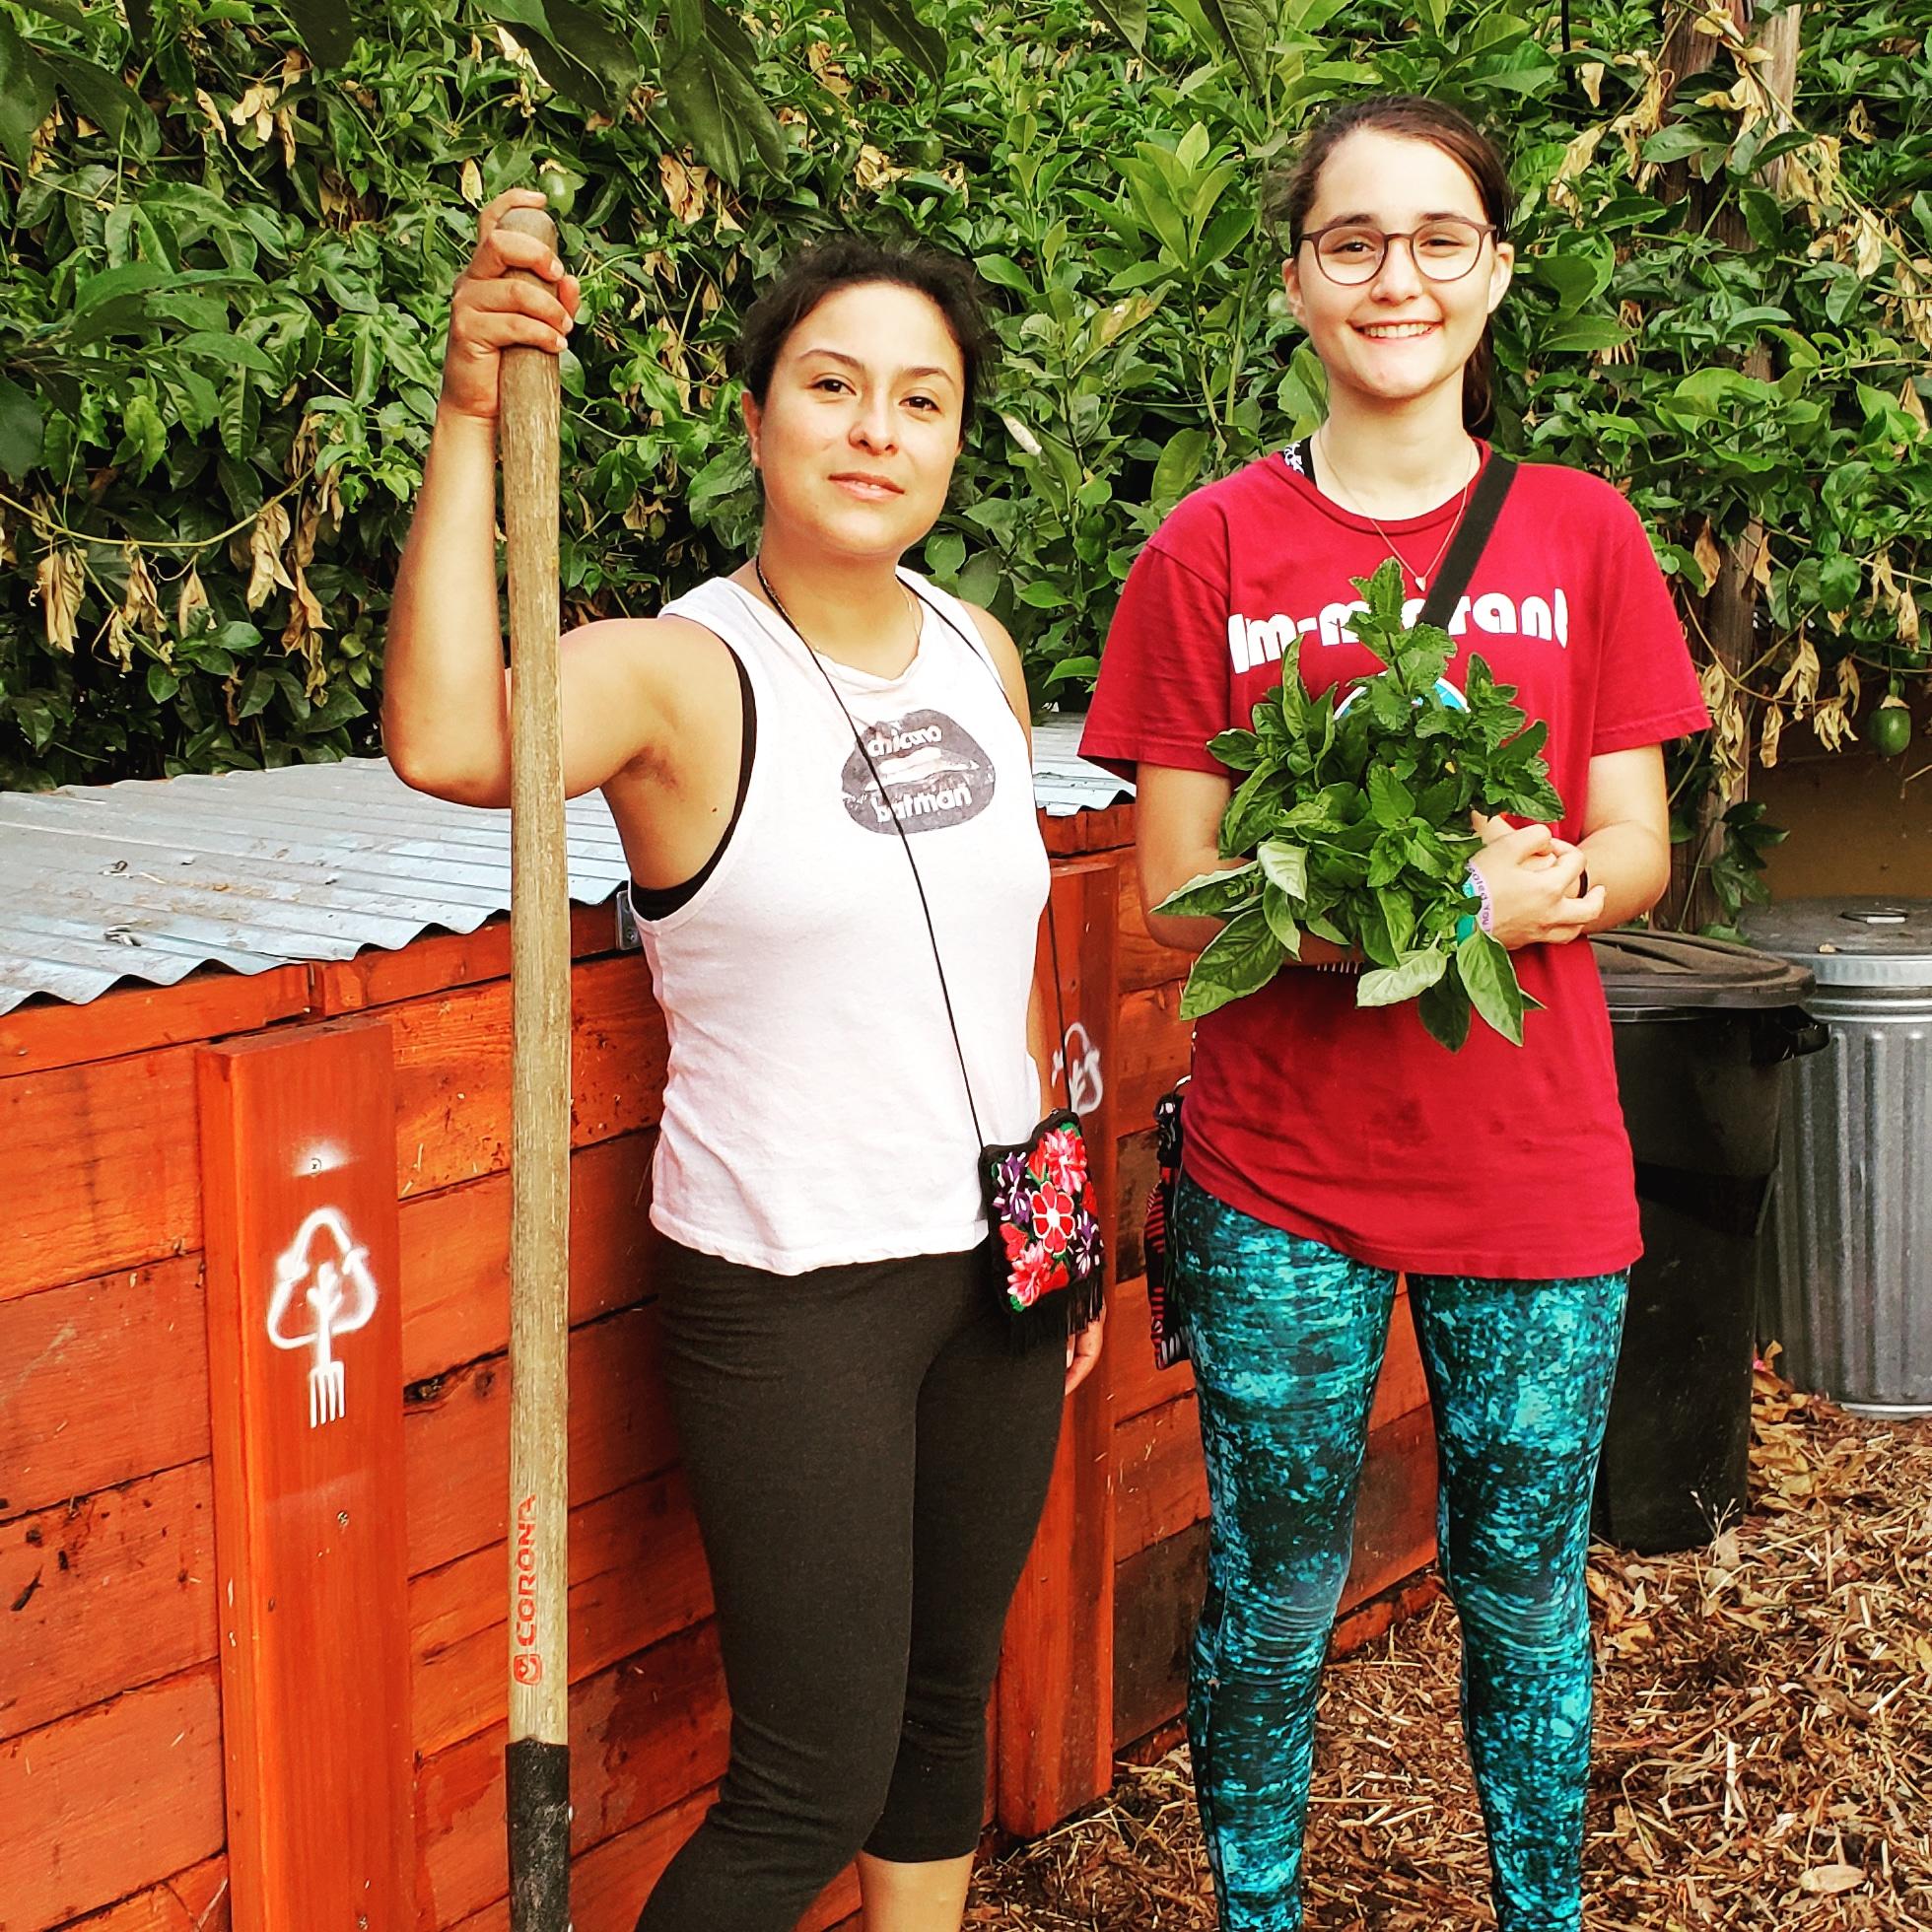 Vanedy Medina, PJLA Community Compost Maker, and Regina Ortiz, Echo Park Youth Volunteer, at the EP Community Compost Hub.